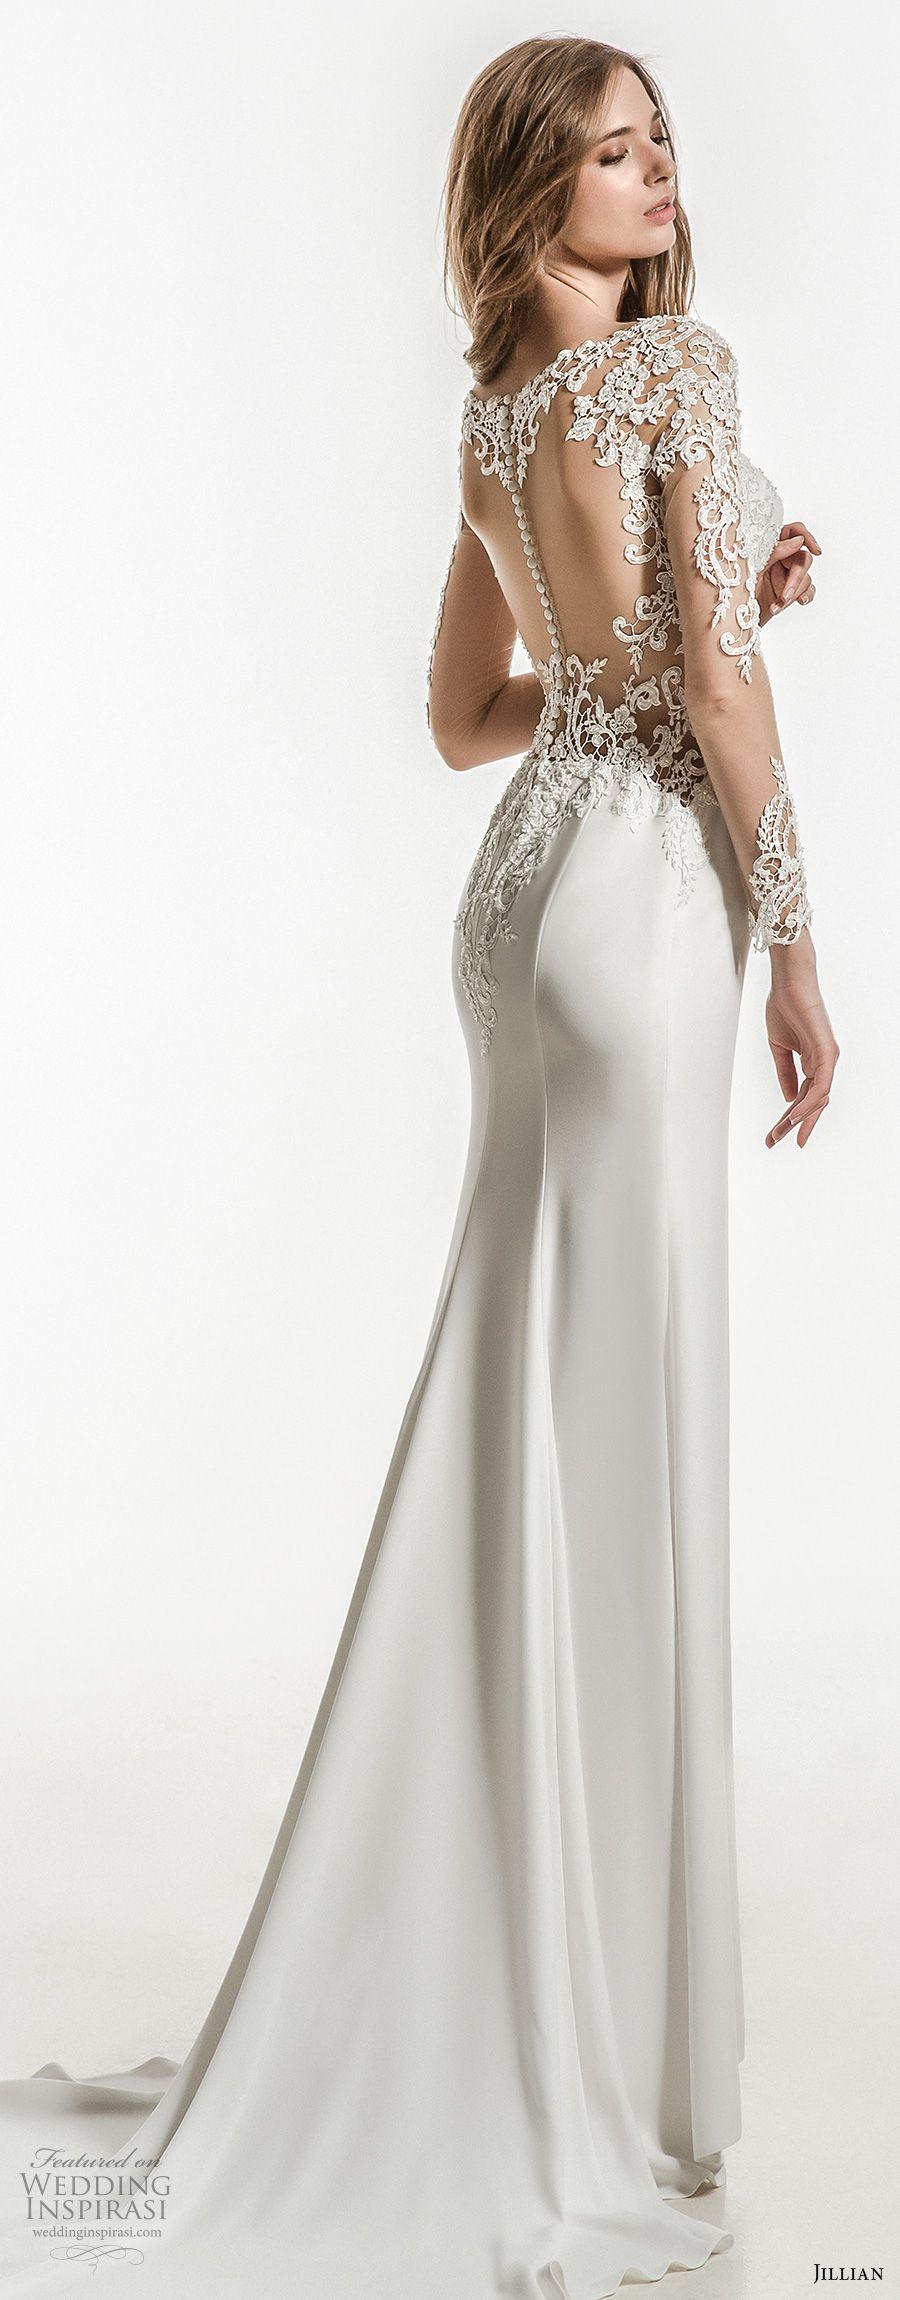 Jillian wedding dresses wedding dresses pinterest bodice